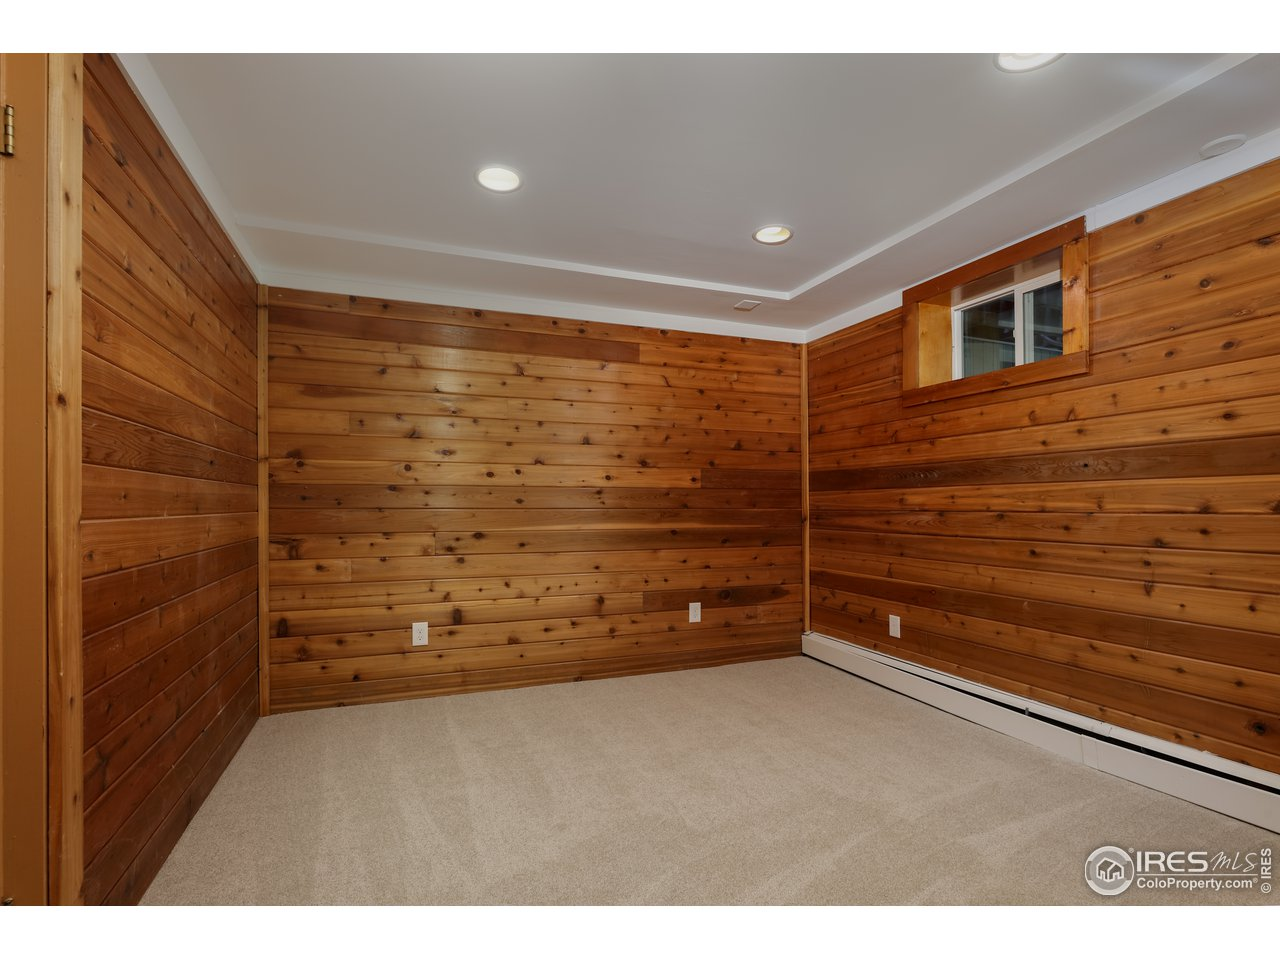 Basement Half-Bathroom